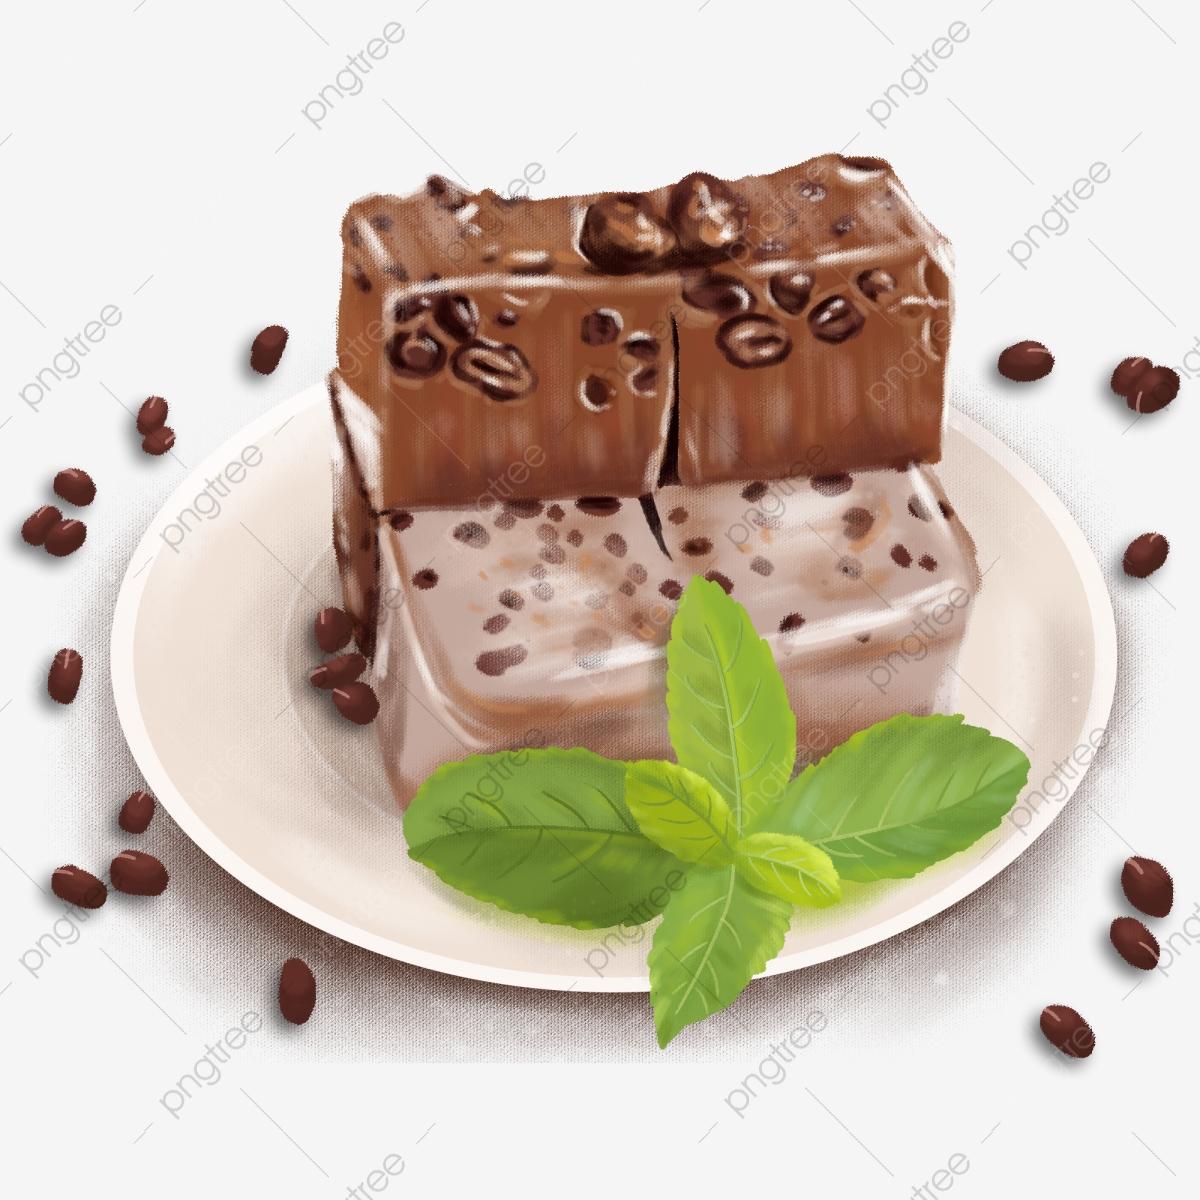 Dessert sweets food juice. Desserts clipart coconut cake